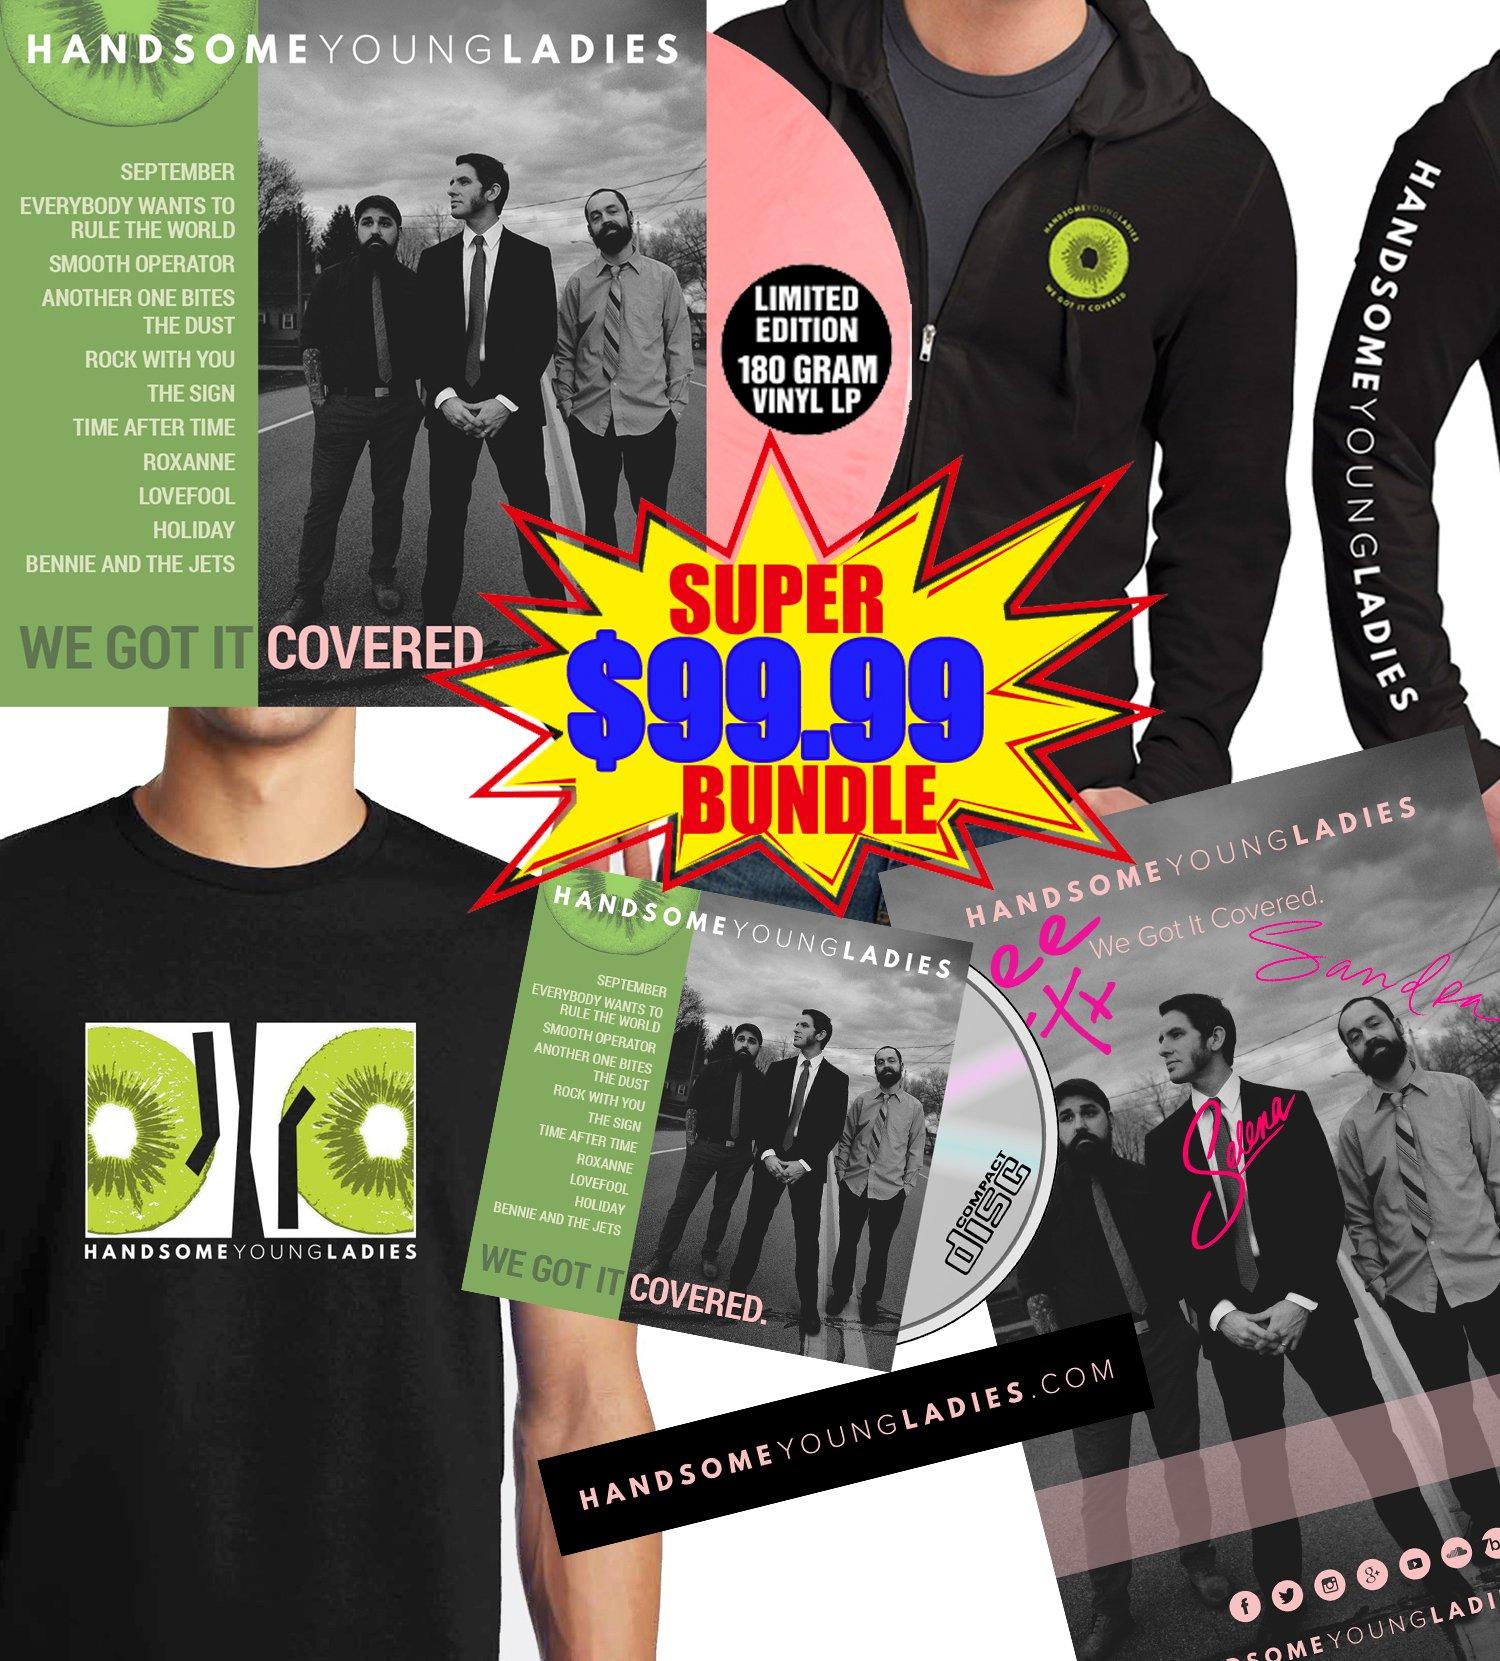 Image of PRE-ORDER: SUPER BUNDLE (Signed 11x17 Poster + 180 Gram Vinyl LP + CD + Hoodie + T-Shirt + Sticker)